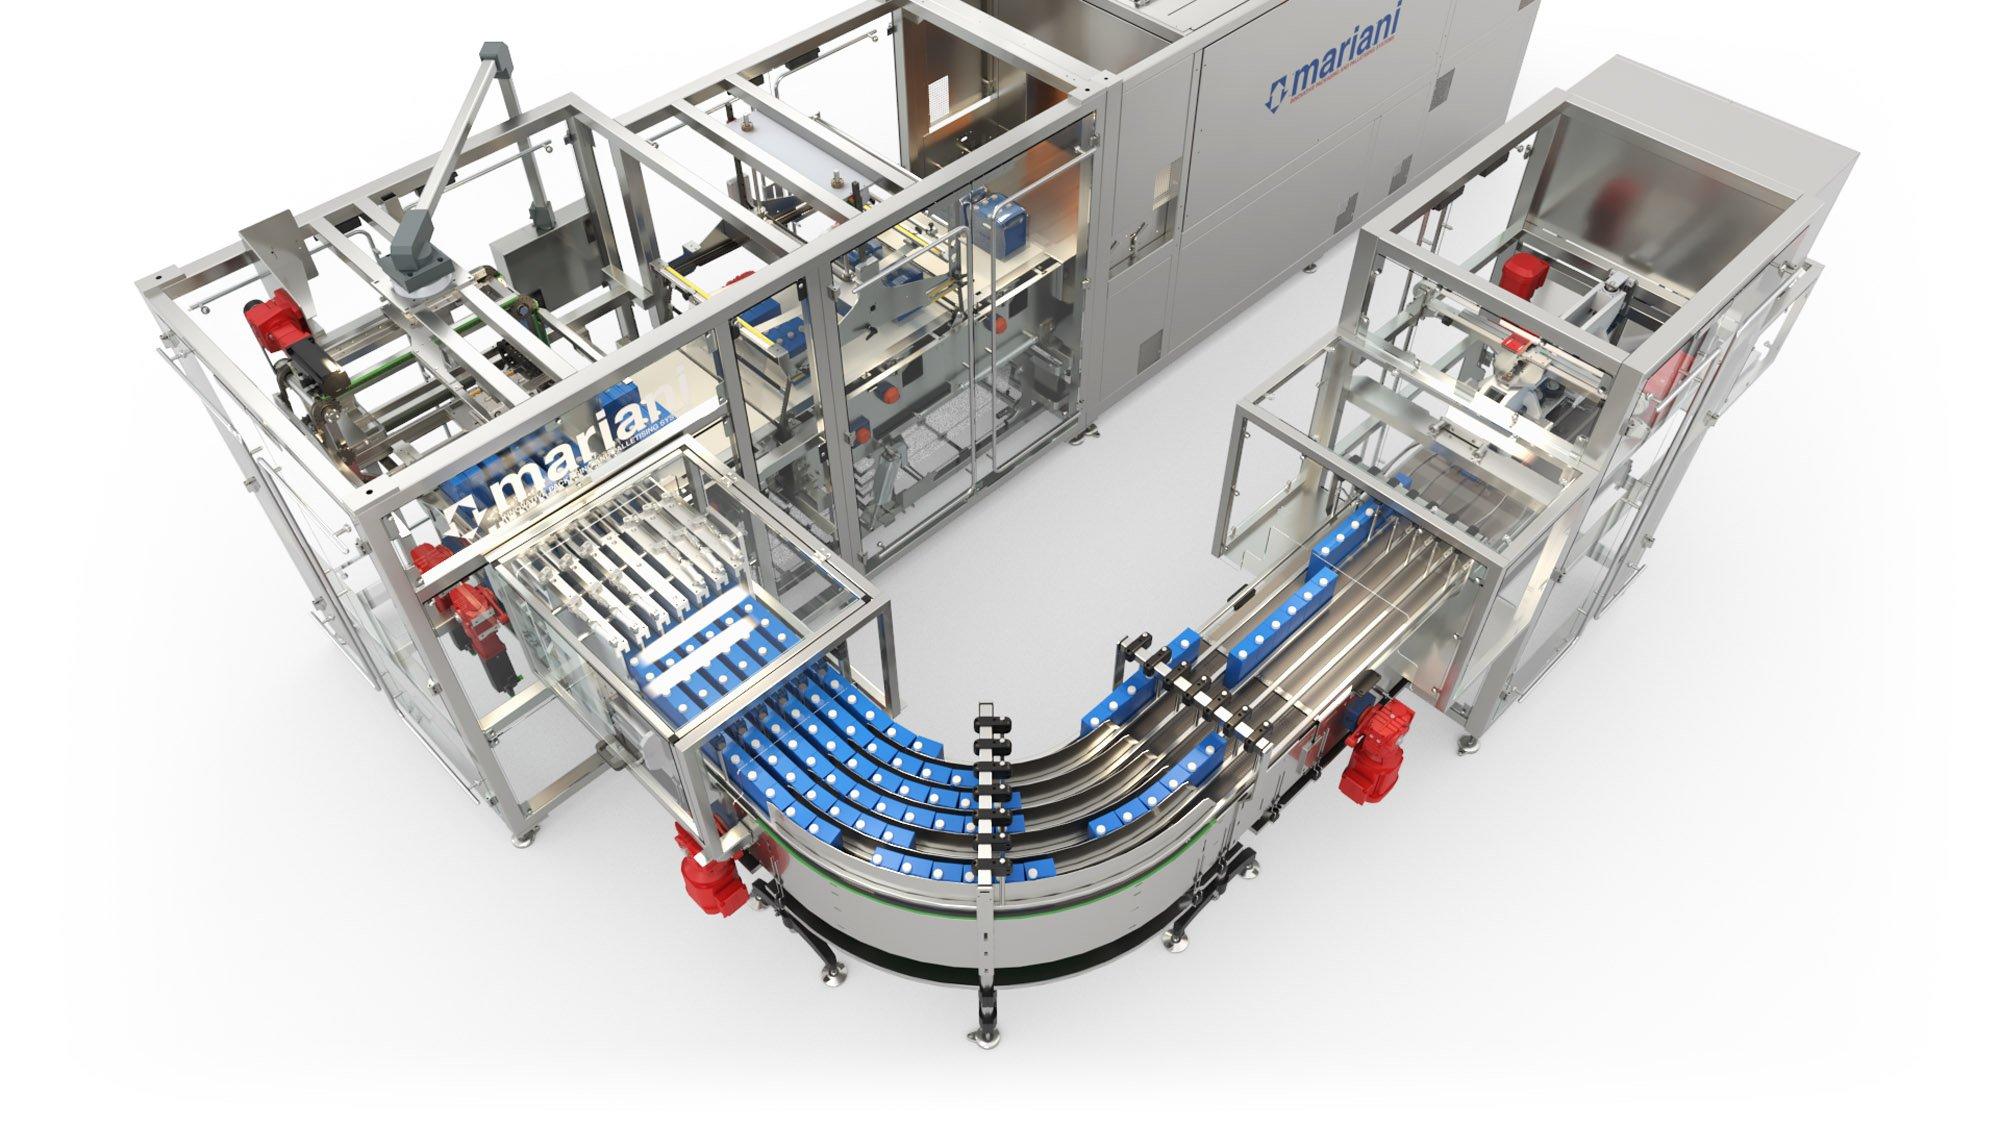 TRM-700 LF accumulation conveyors 1 - Mariani Srl